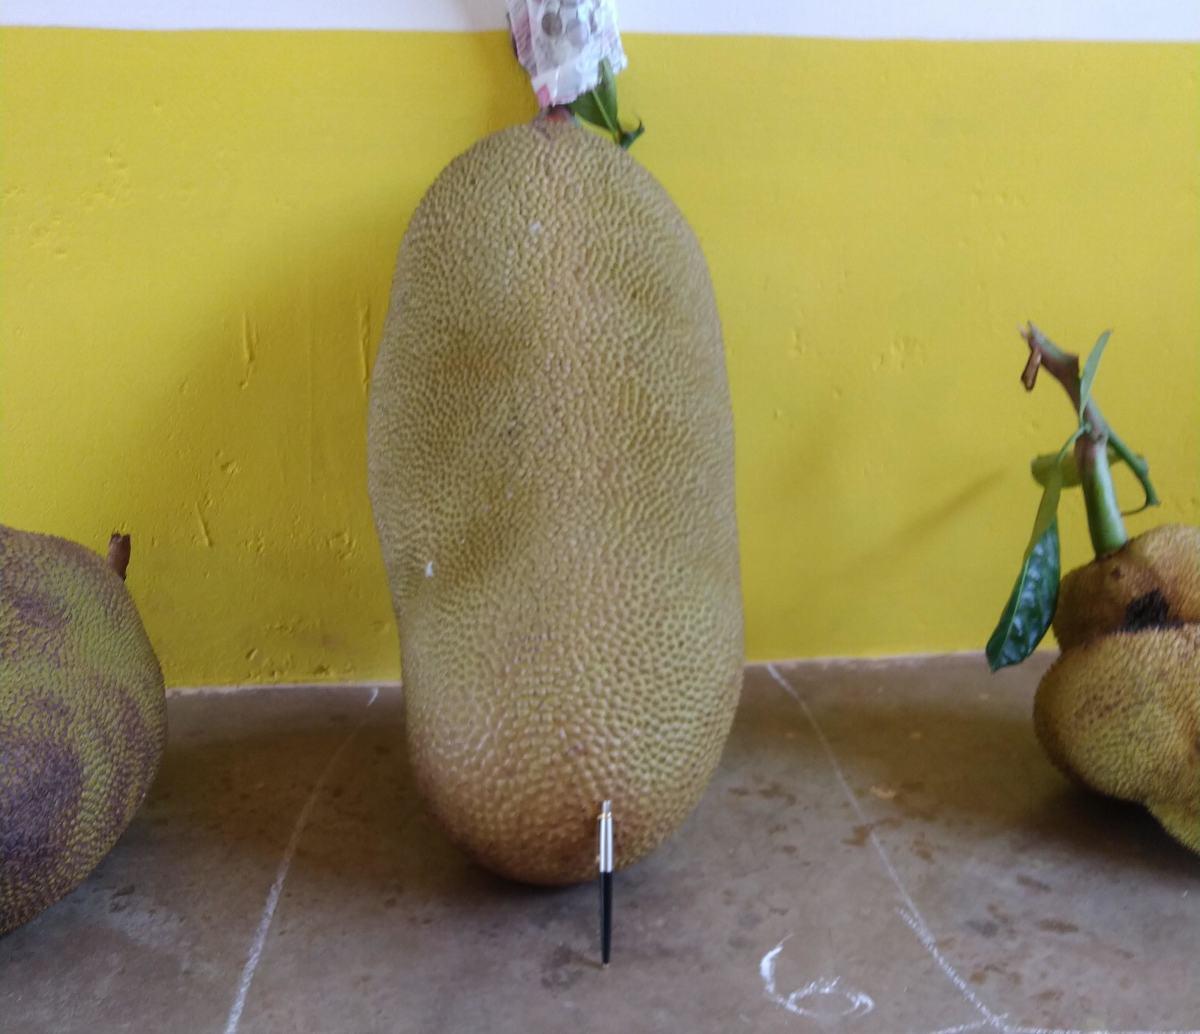 A large elongate jackfruit